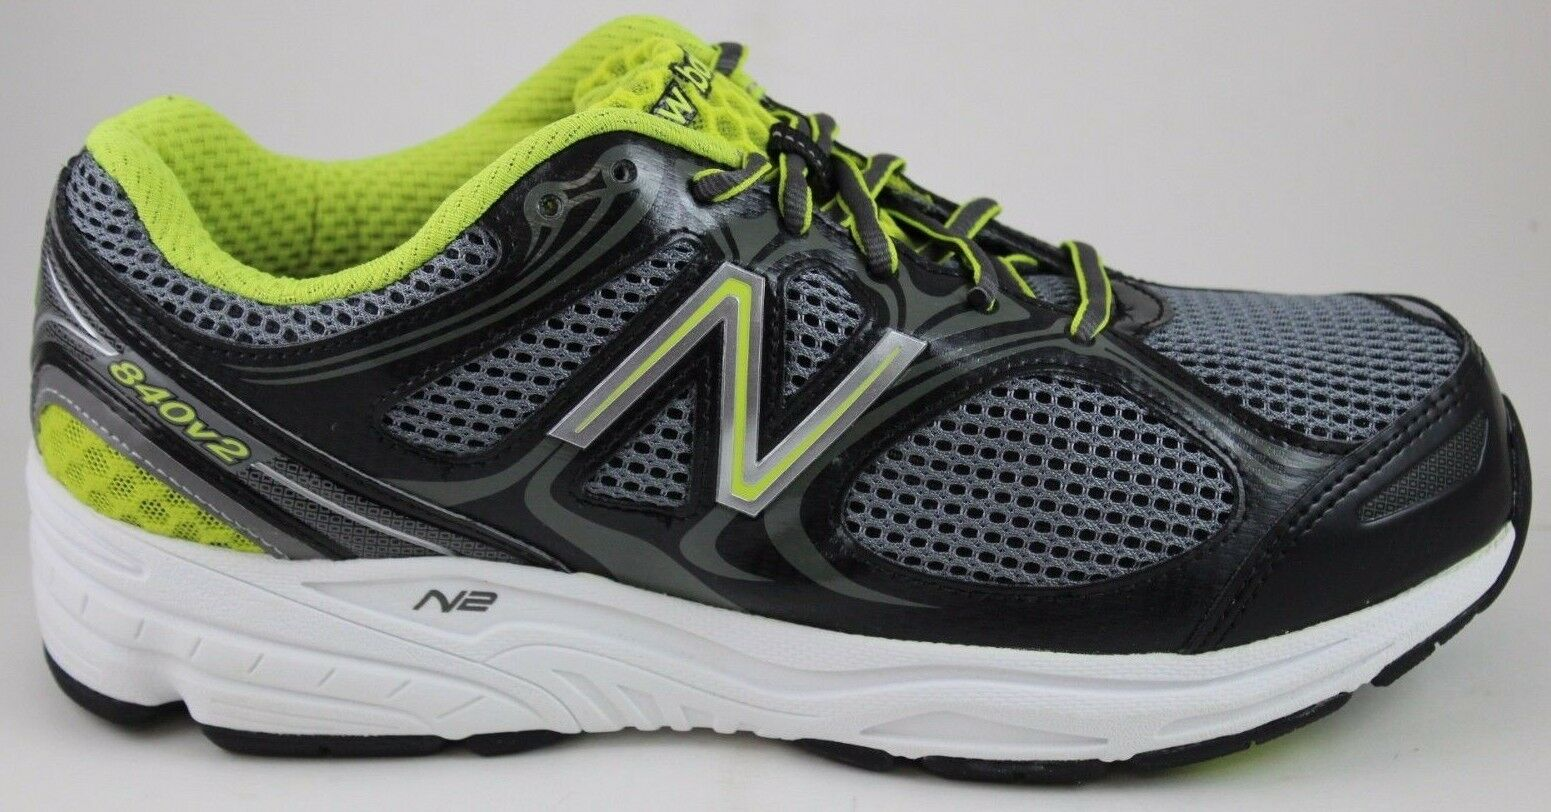 New Balance da Uomo Running 840 v2 M840BG2 Nero/Grigio/Verde Nuove in Scatola